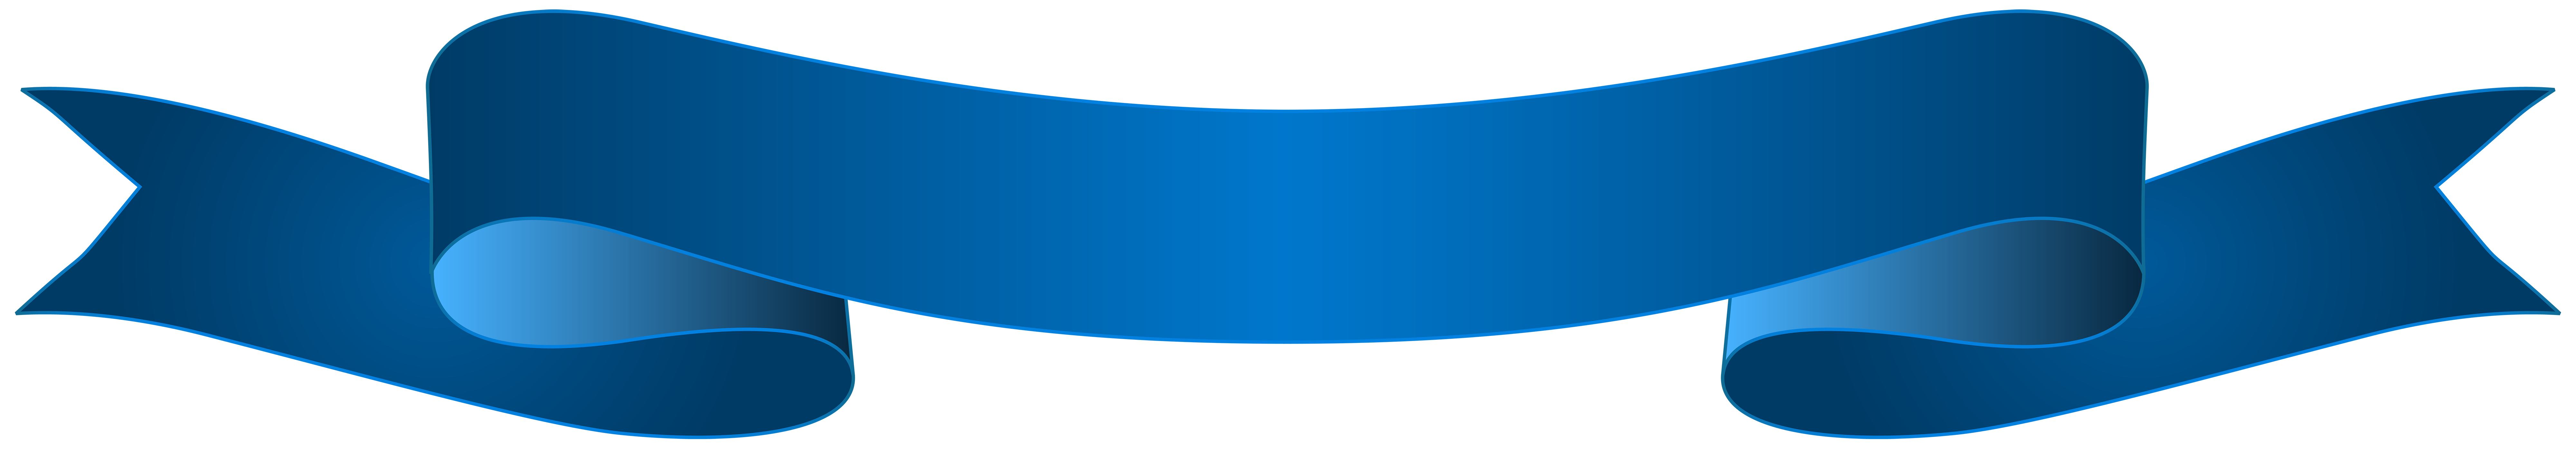 Blue banner transparent clip. Clipart anchor ribbon